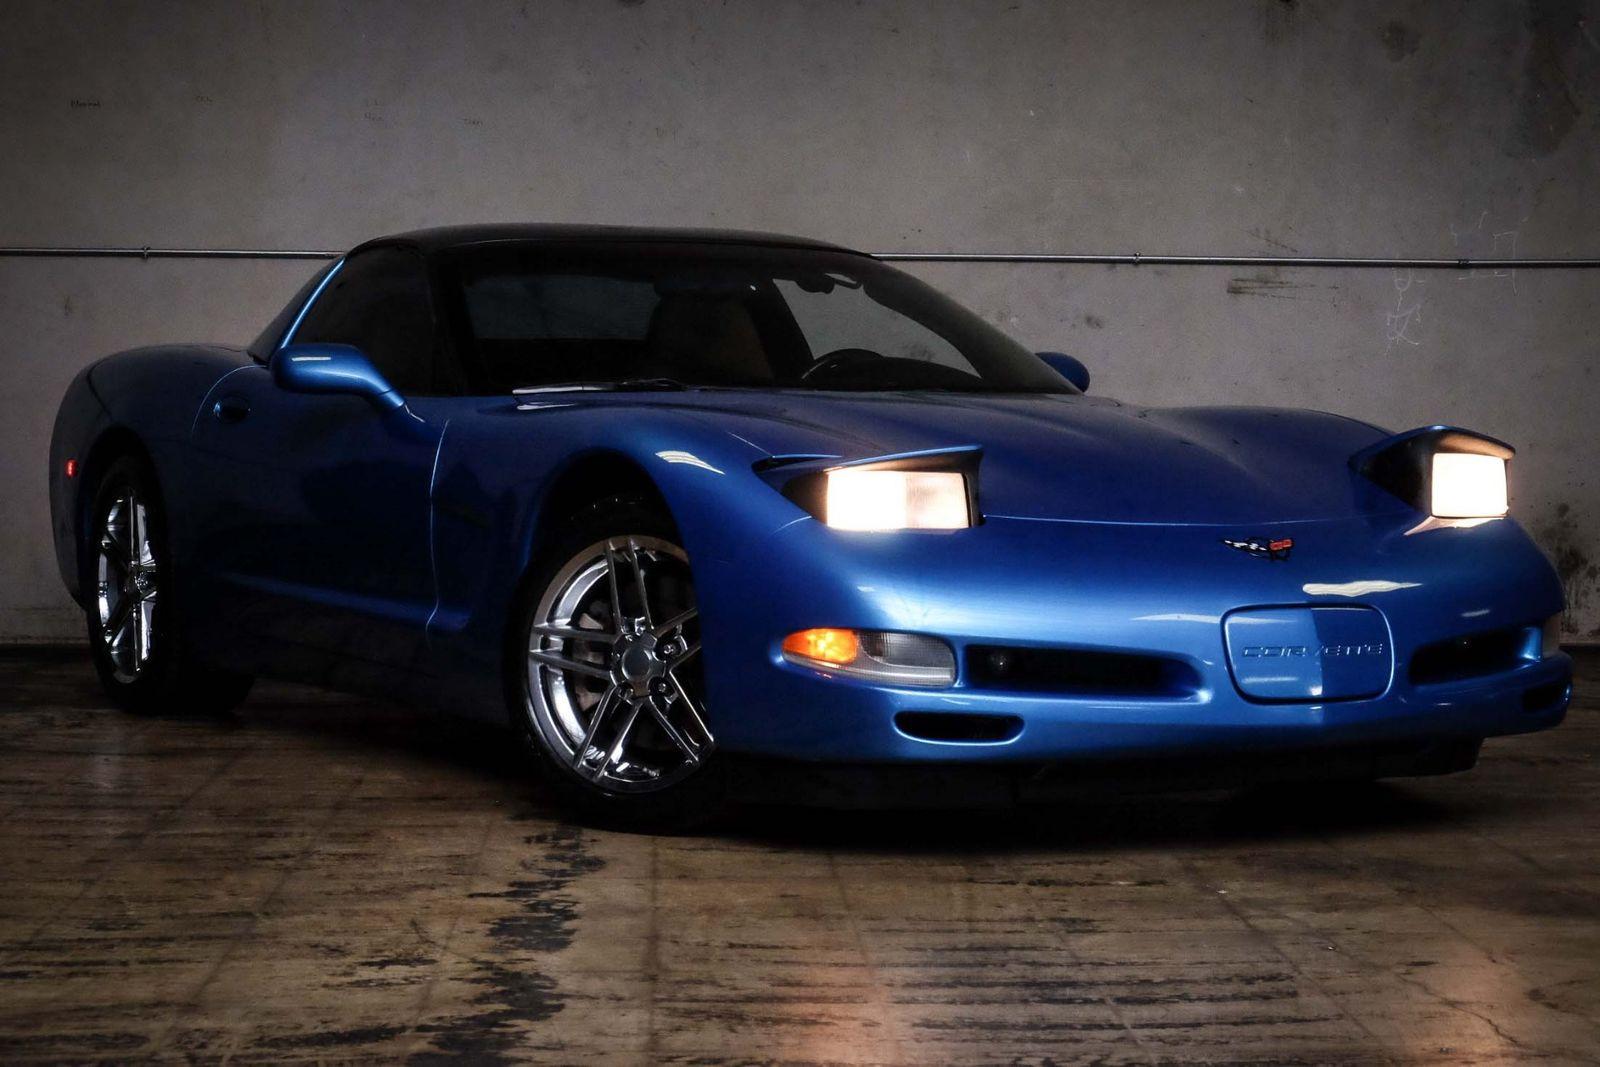 2000 Blue Chevrolet Corvette   | C5 Corvette Photo 2